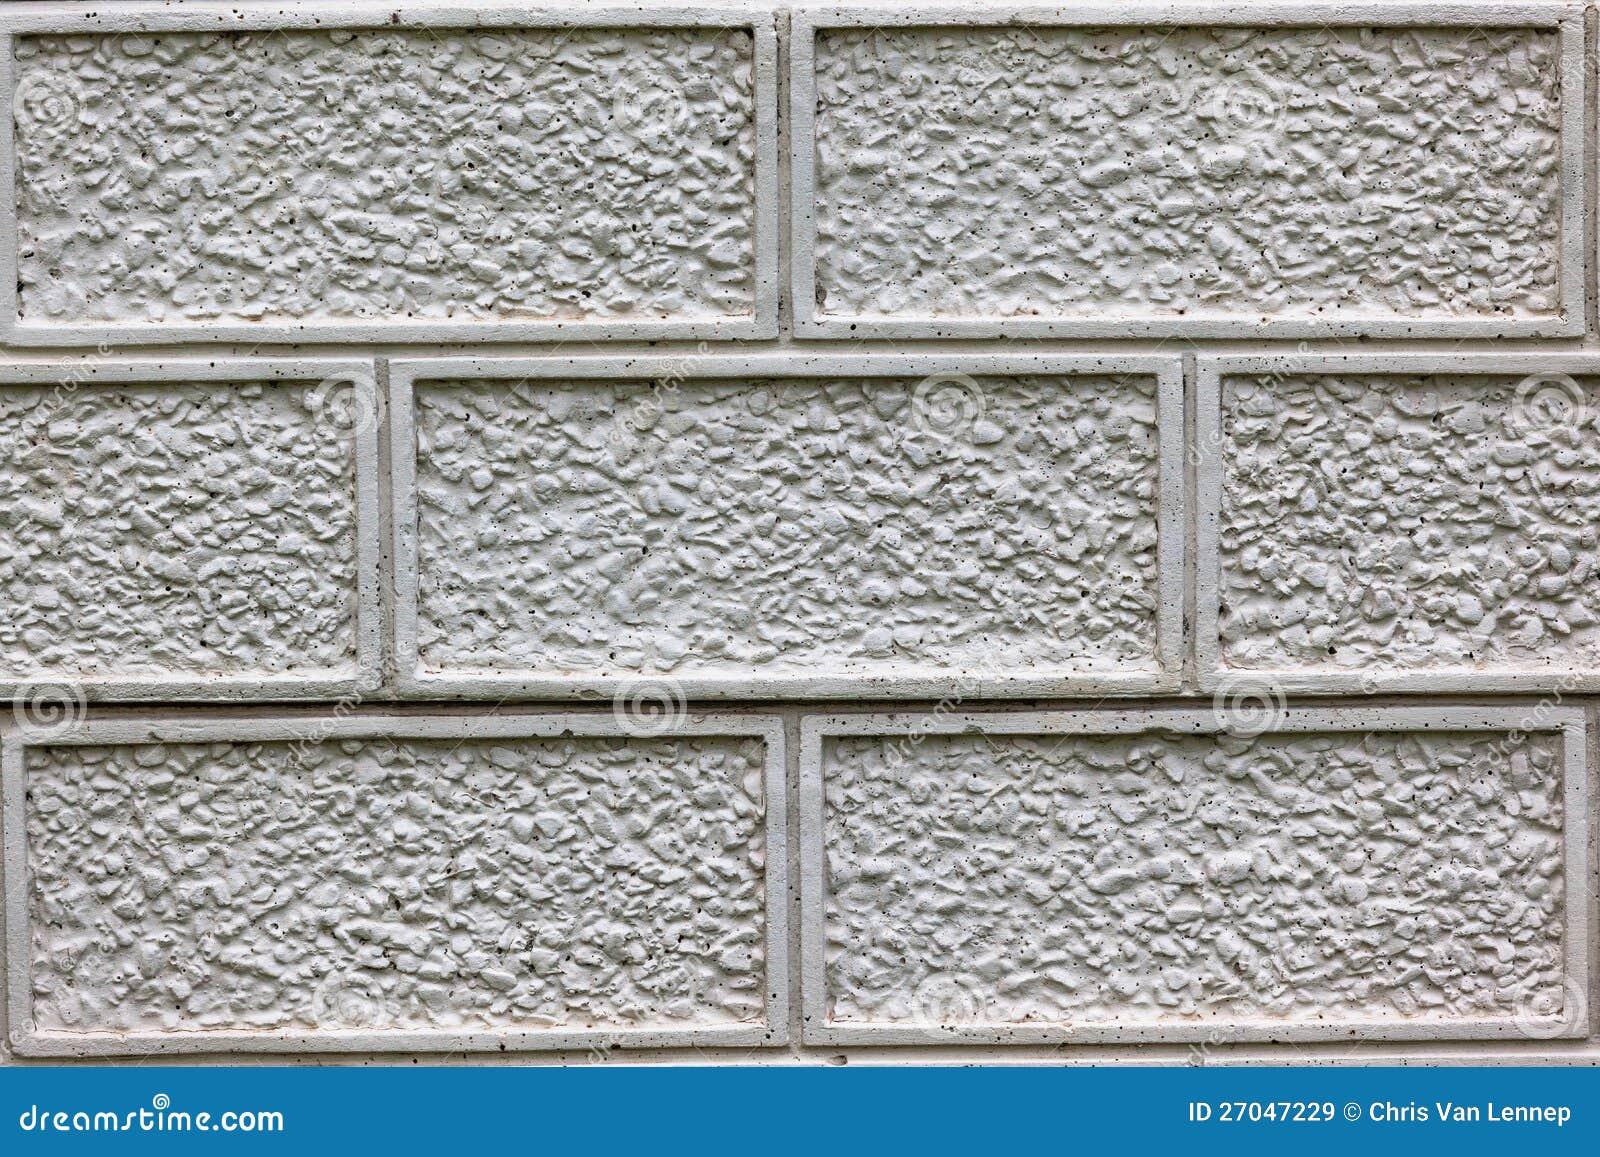 Concrete design slate fence stock image image 27047229 - Concrete fence models design ...